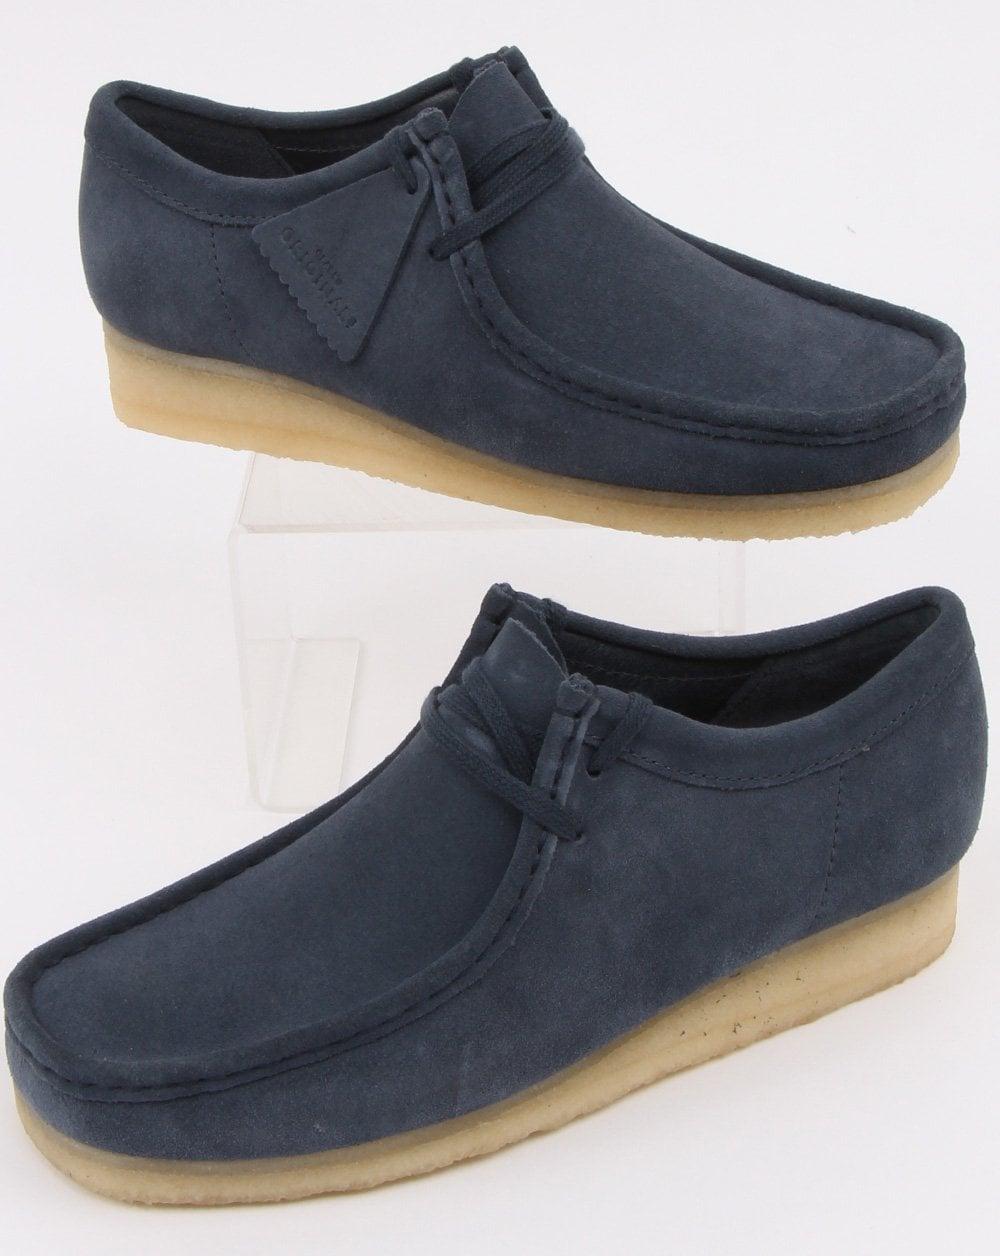 Clarks Originals Wallabee Shoes Deep